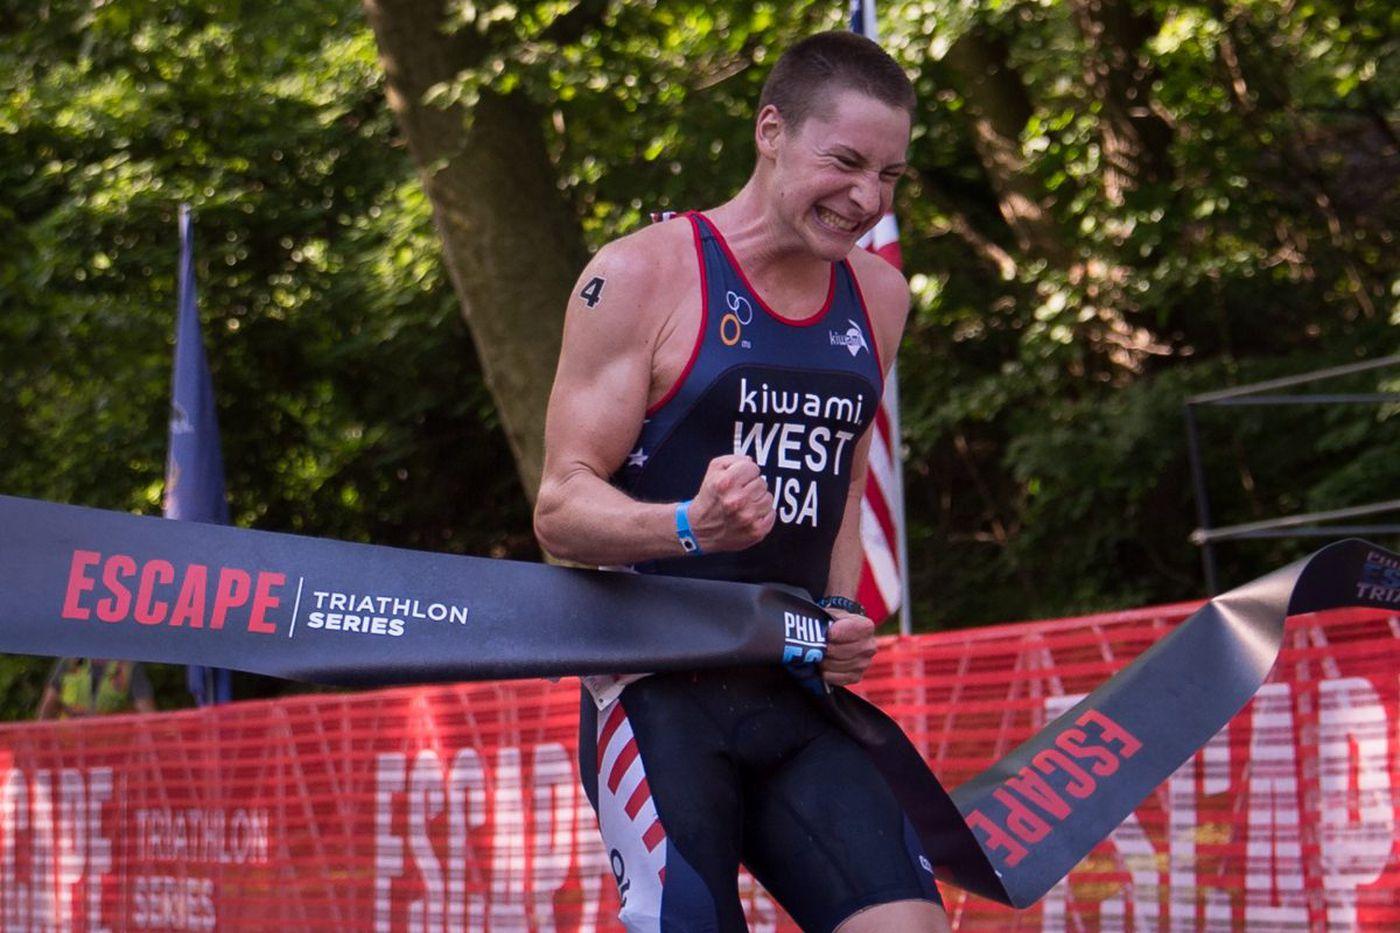 Philadelphia Triathlon: No swimming, plenty of competition